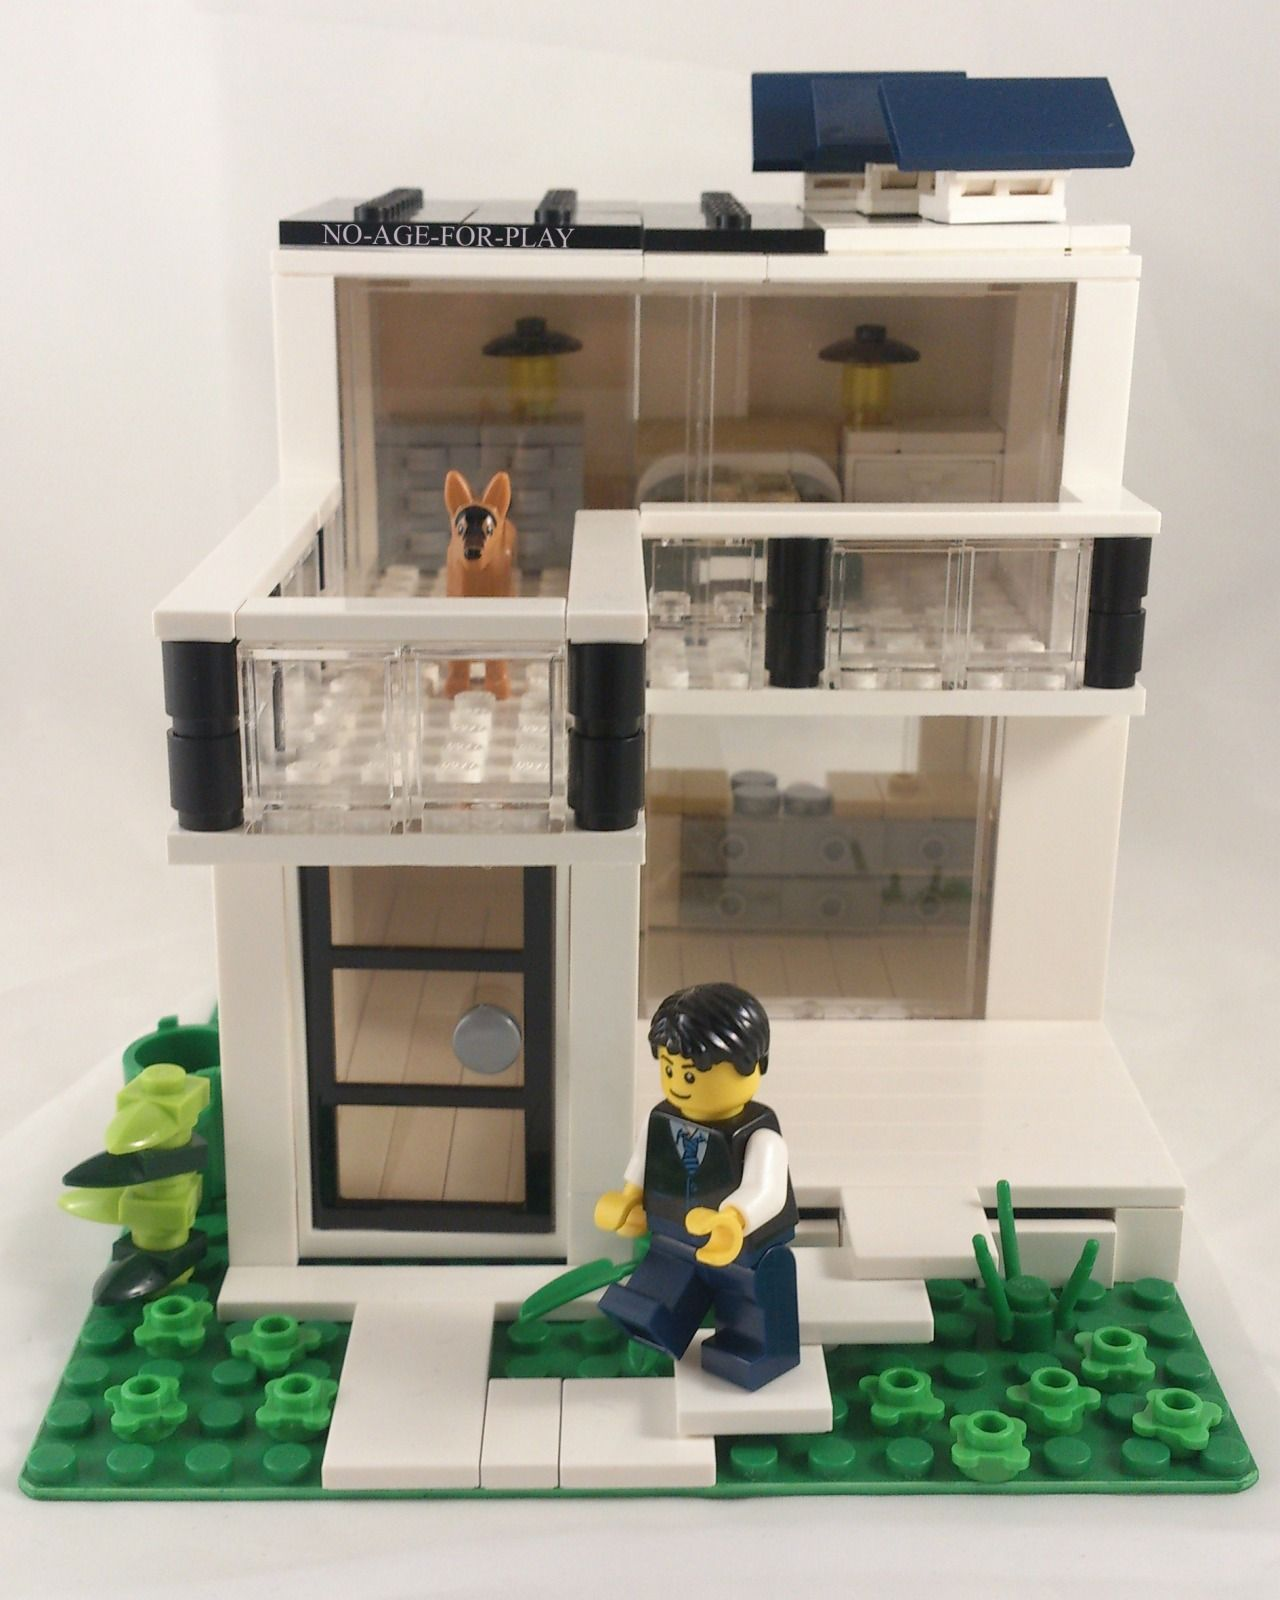 Moc Noageforplay Modern House Solar Energy Meubles De Lego Idees Lego Maison Lego